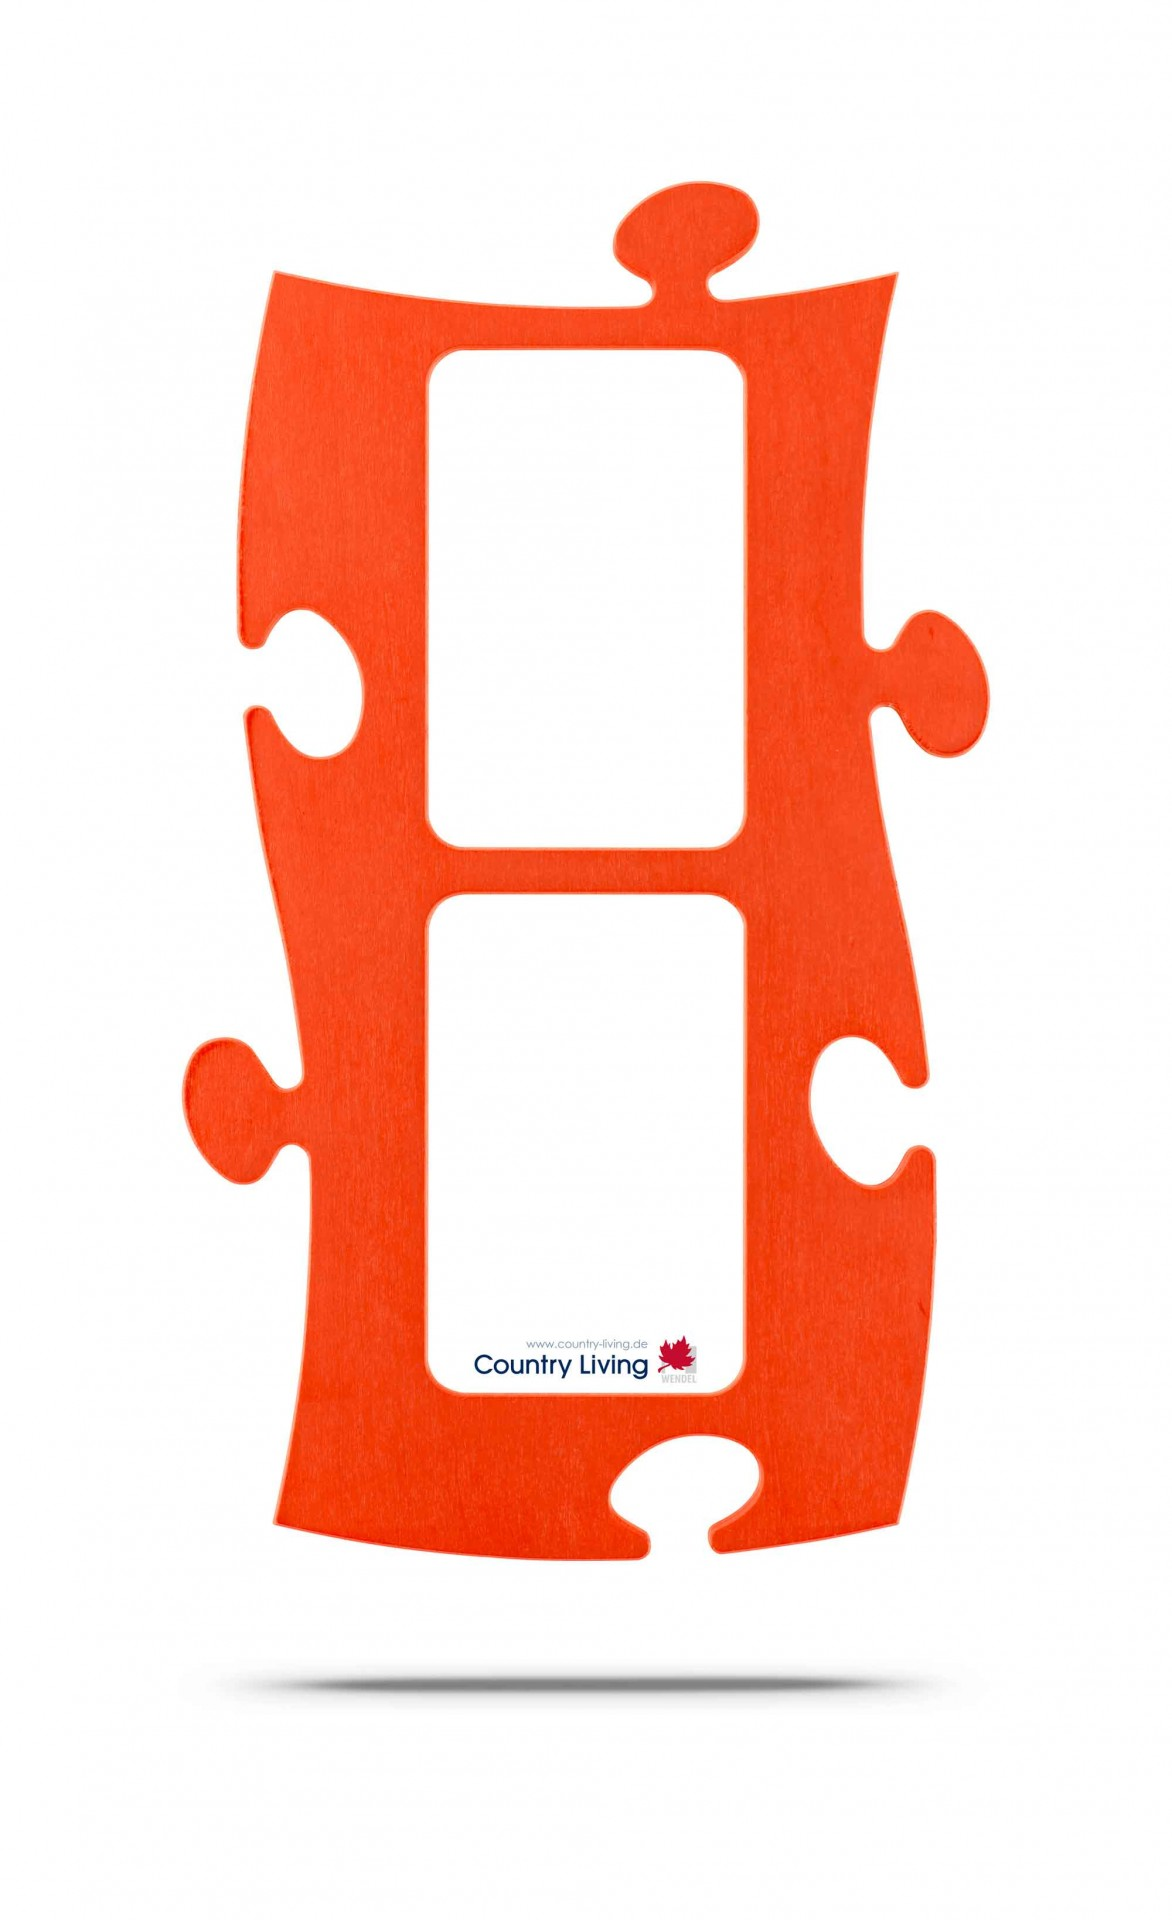 Country Living Moldura Puzzle+ (2x) 10x15cm laranja